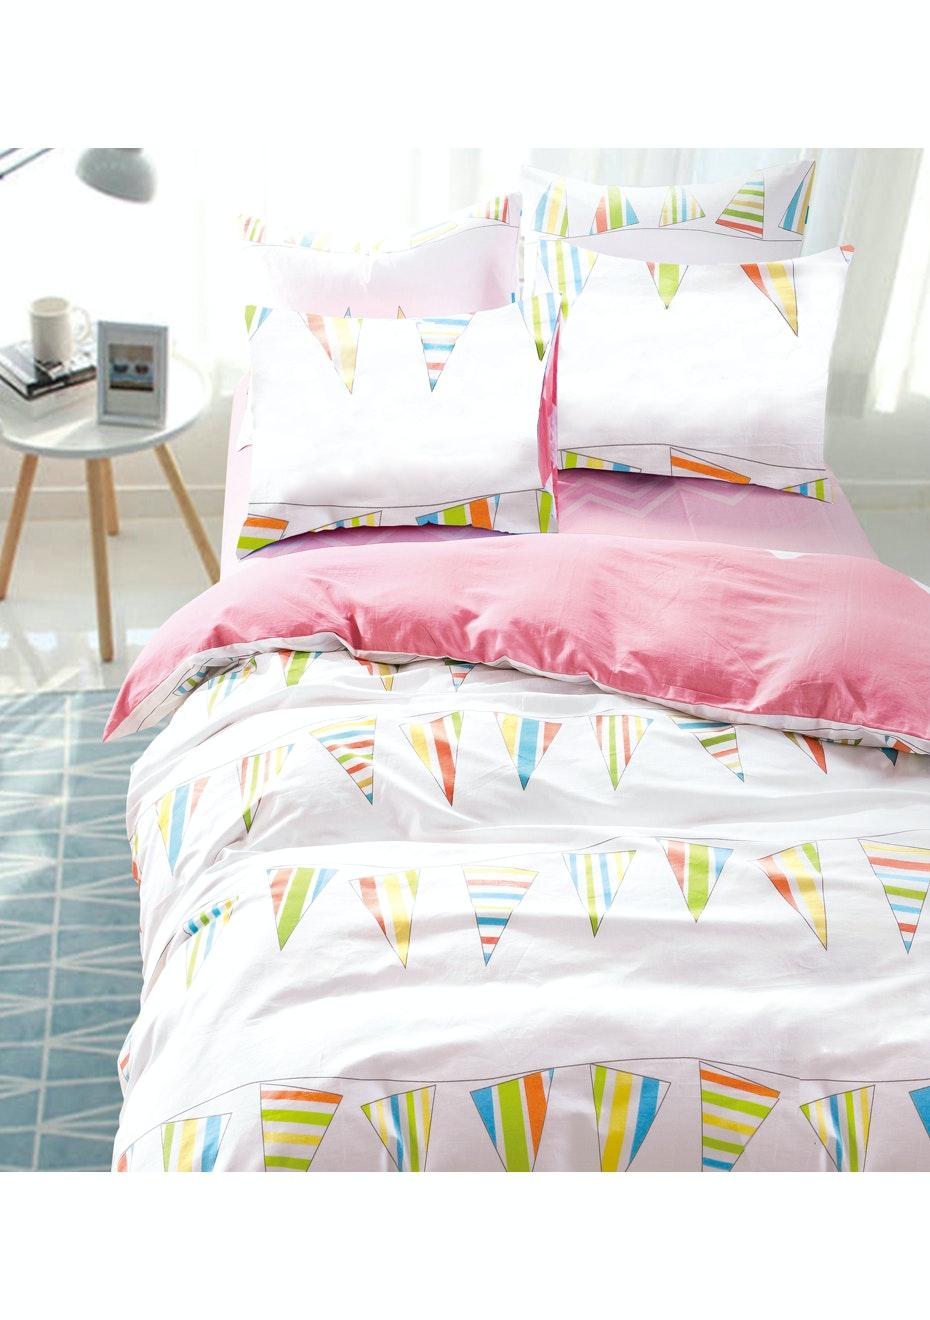 Carnival Quilt Cover Set - Reversible Design - 100% Cotton Single Bed